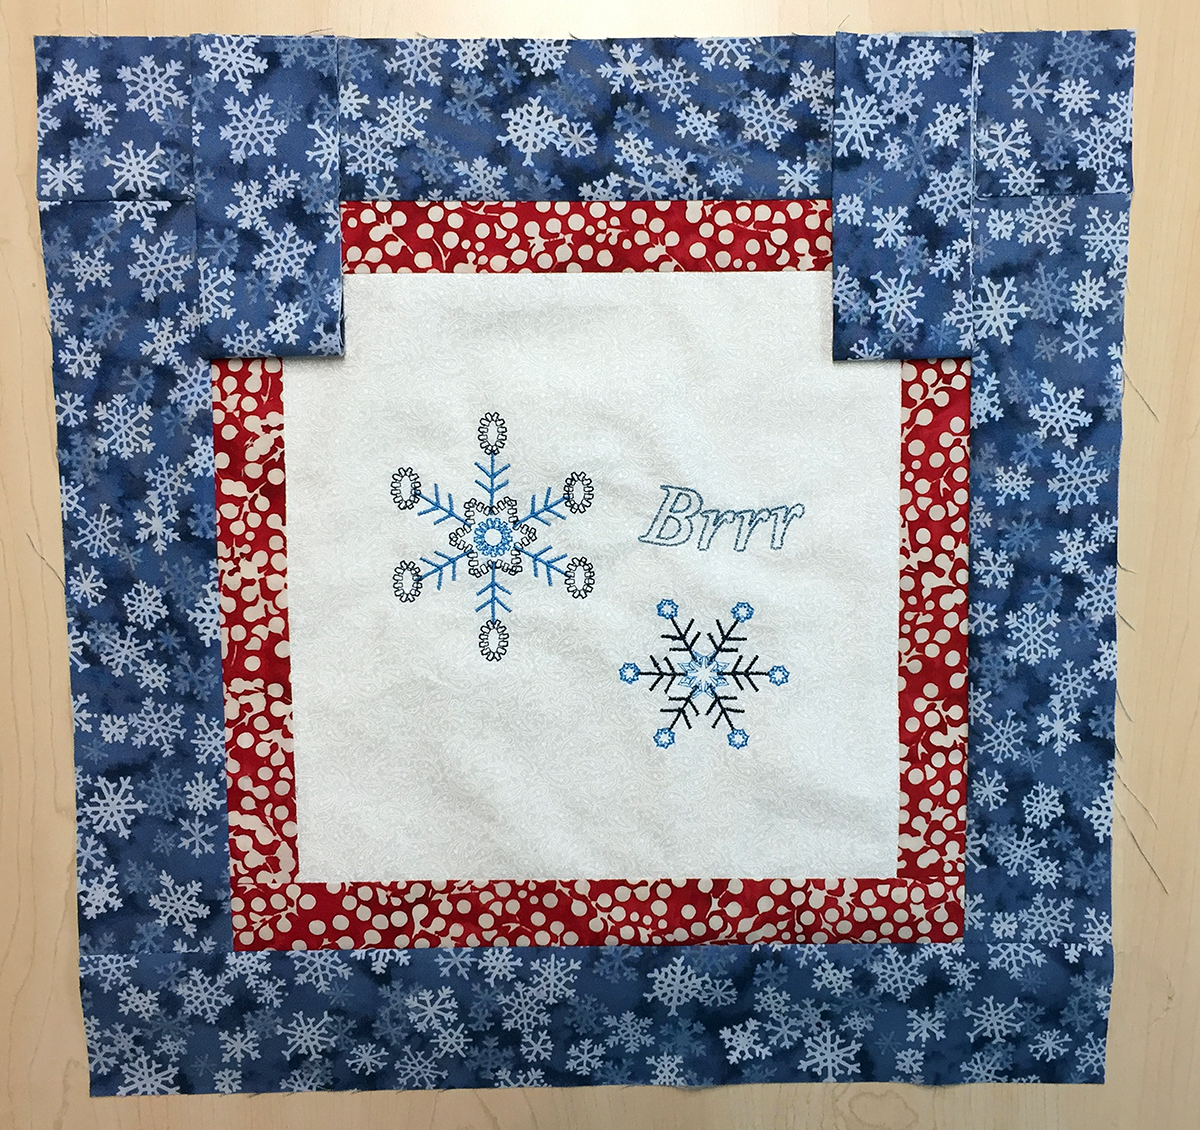 14 Snowflake Brrr with hanging tabs.jpg